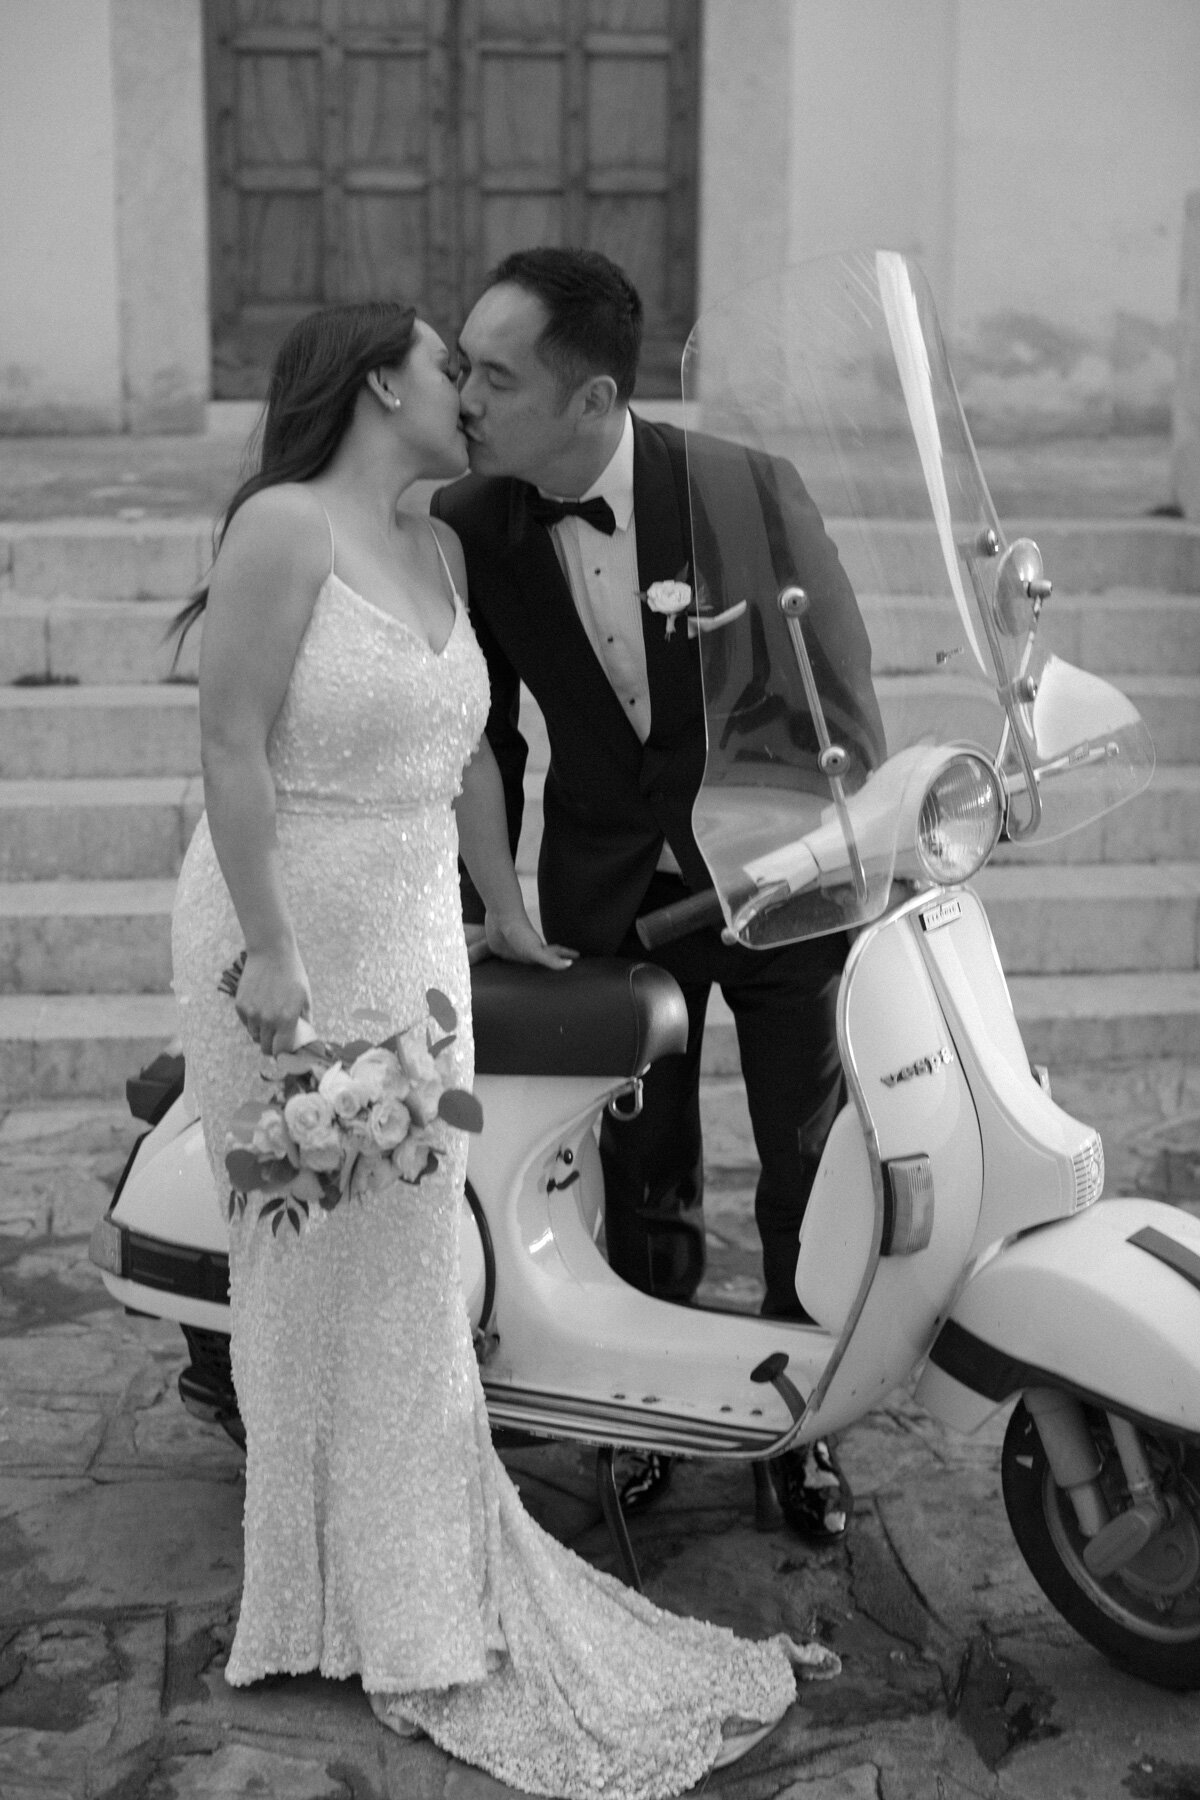 Belmond-Hotel-Caruso-ravello-elopement-Katie-Grant-destination-wedding (45 of 50).jpg